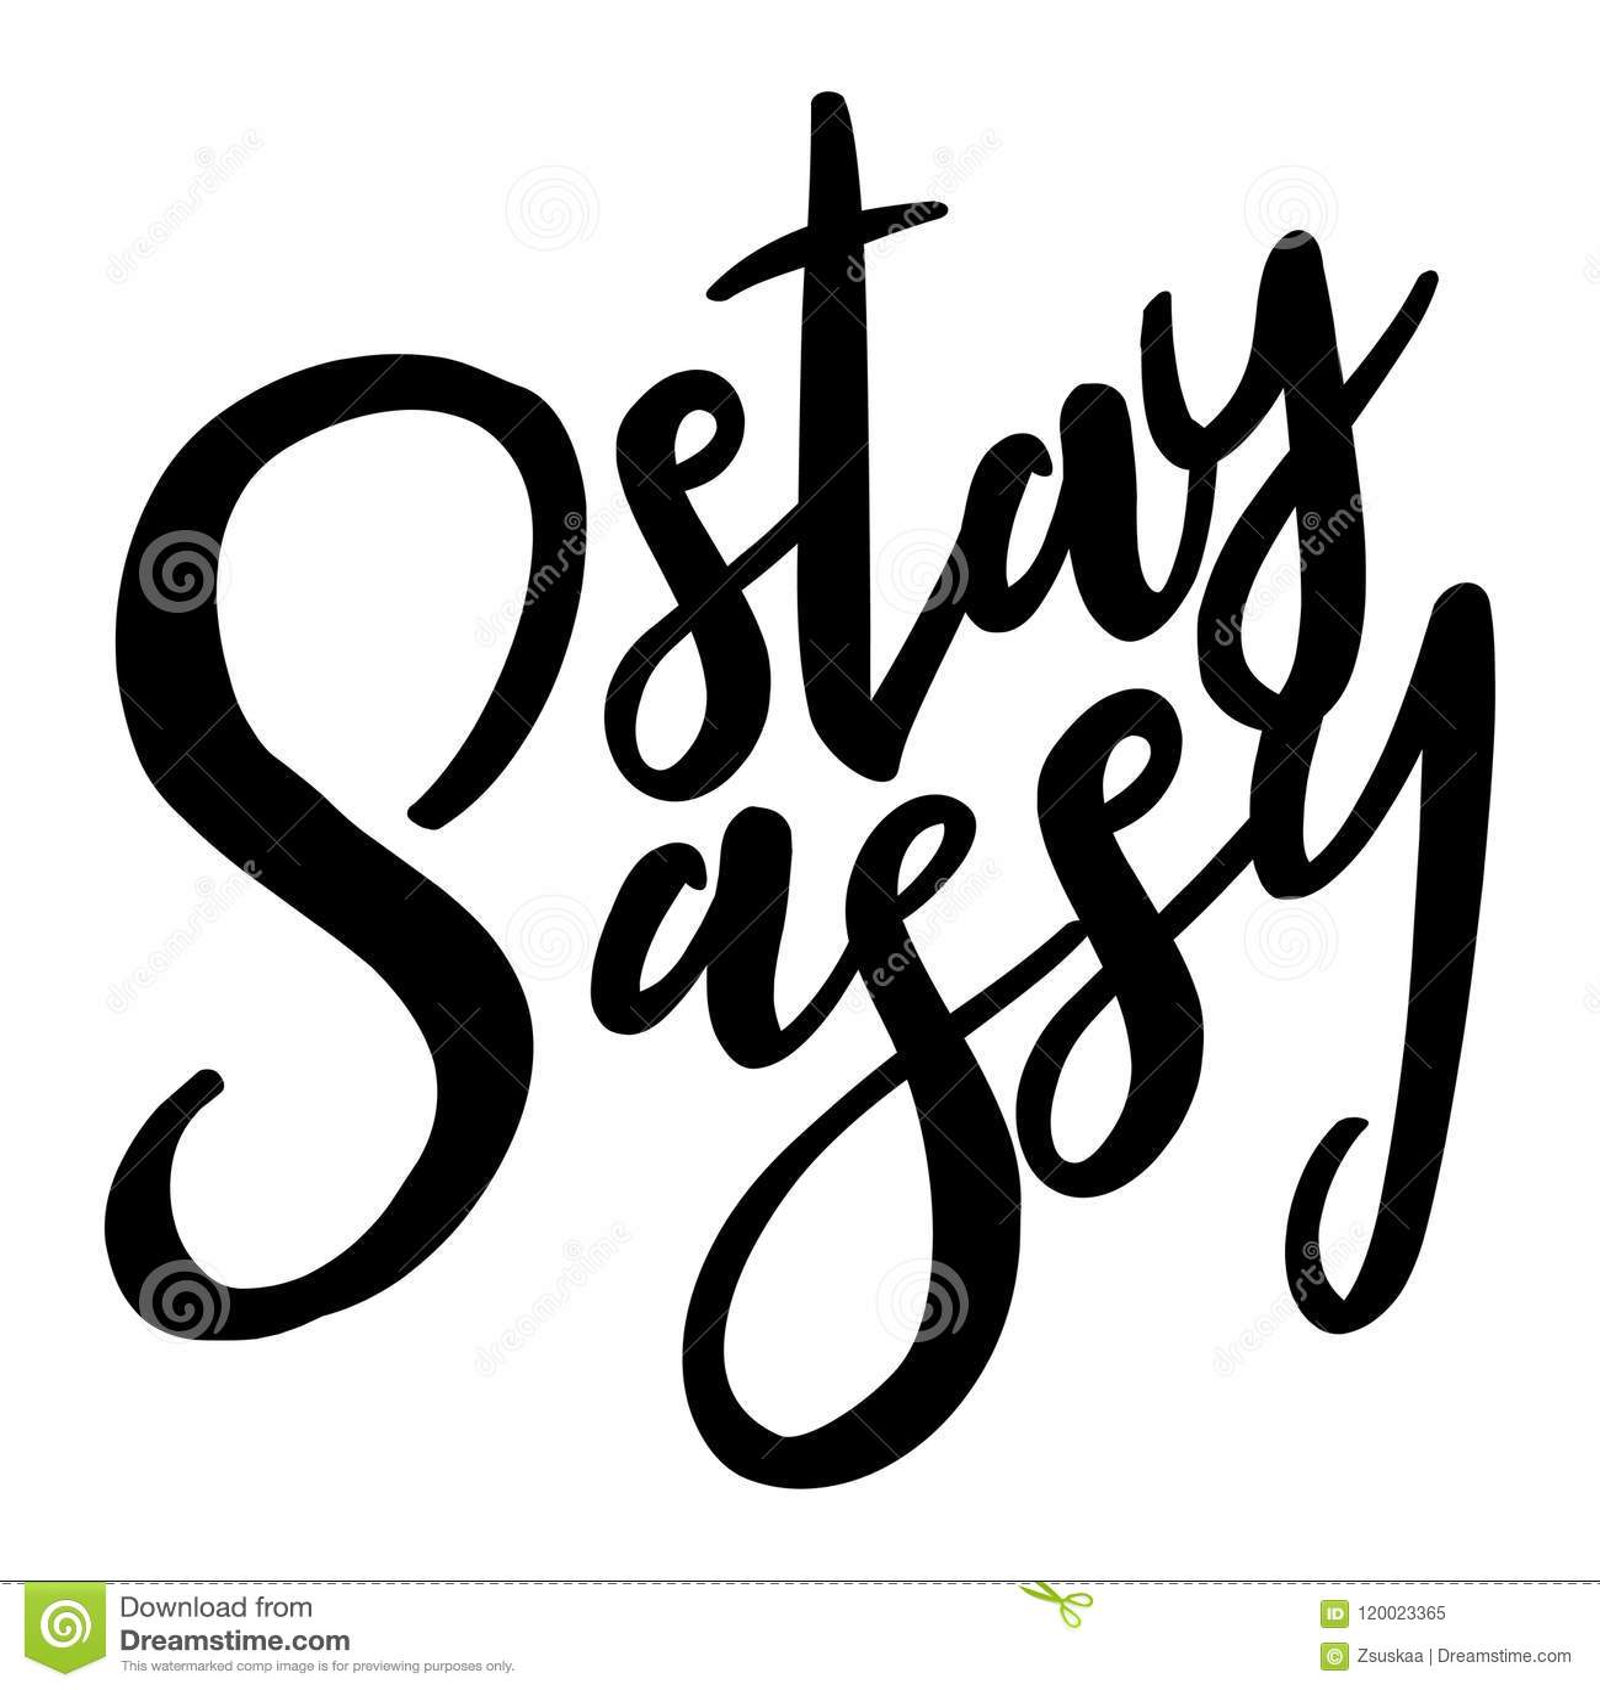 Sassy Stock Illustrations – 301 Sassy Stock Illustrations ...